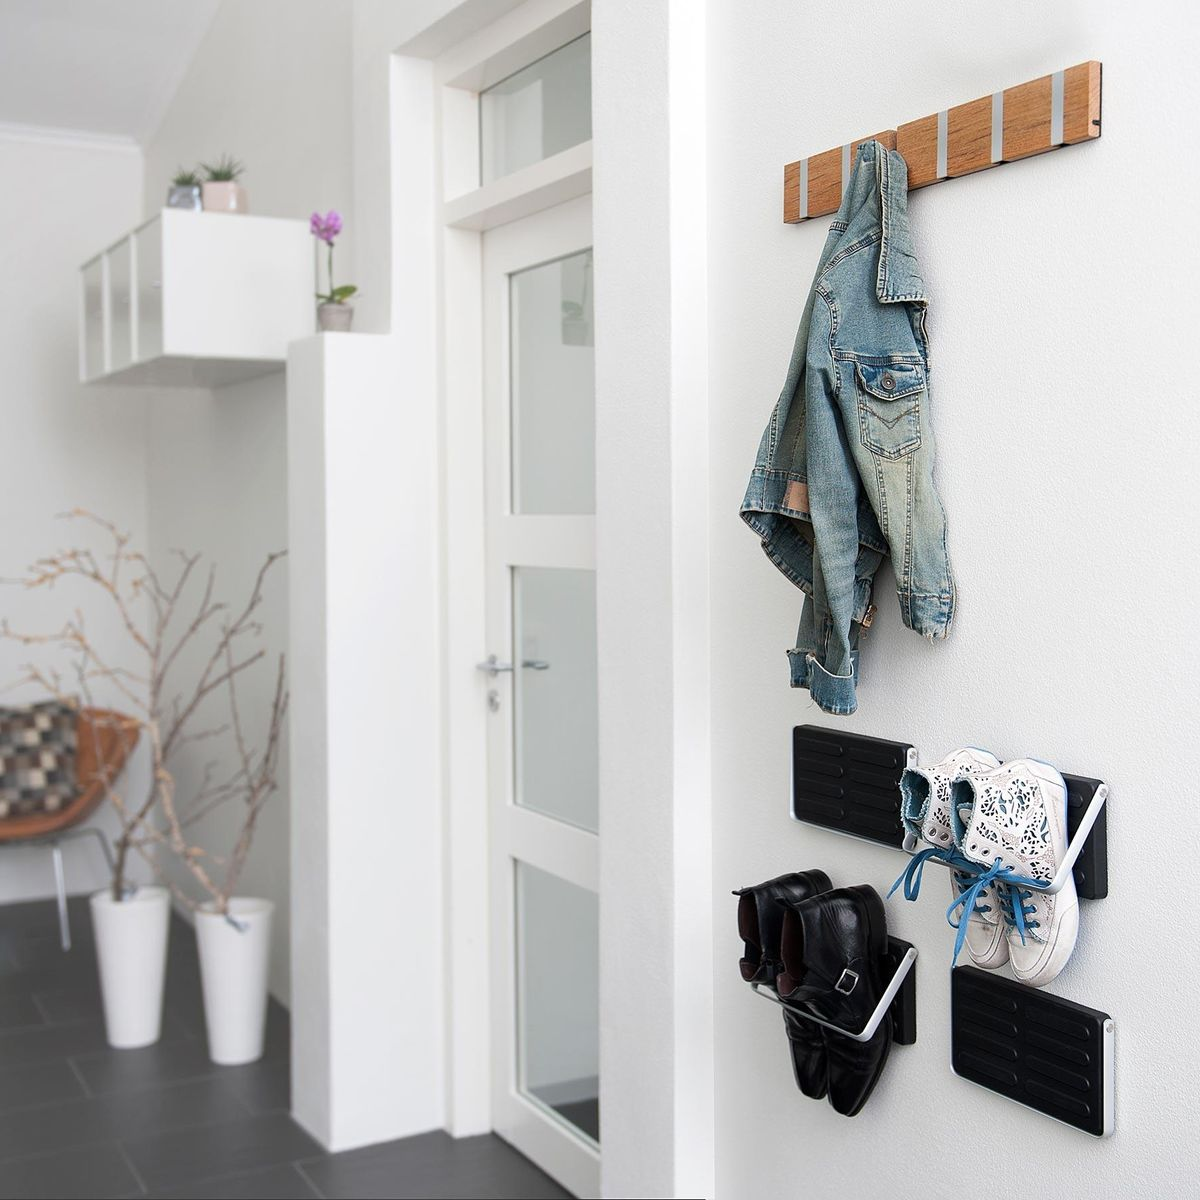 KNAX - Wand Kapstok 6 Haken : LoCa : Garderobe u0026 Haken : Gang ...